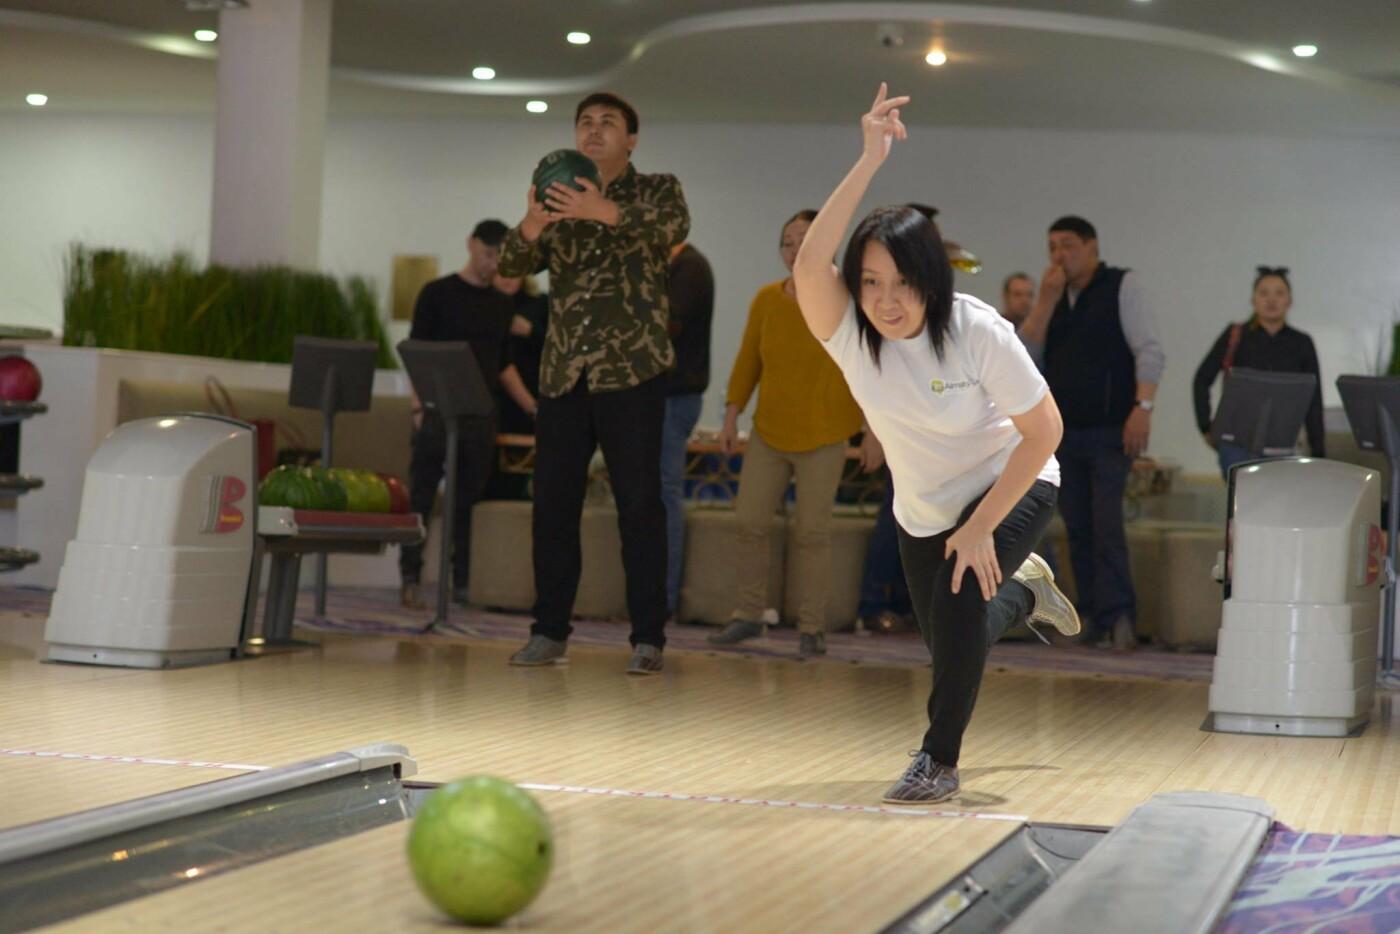 II турнир по боулингу среди журналистов прошел в Алматы (ФОТО), фото-5